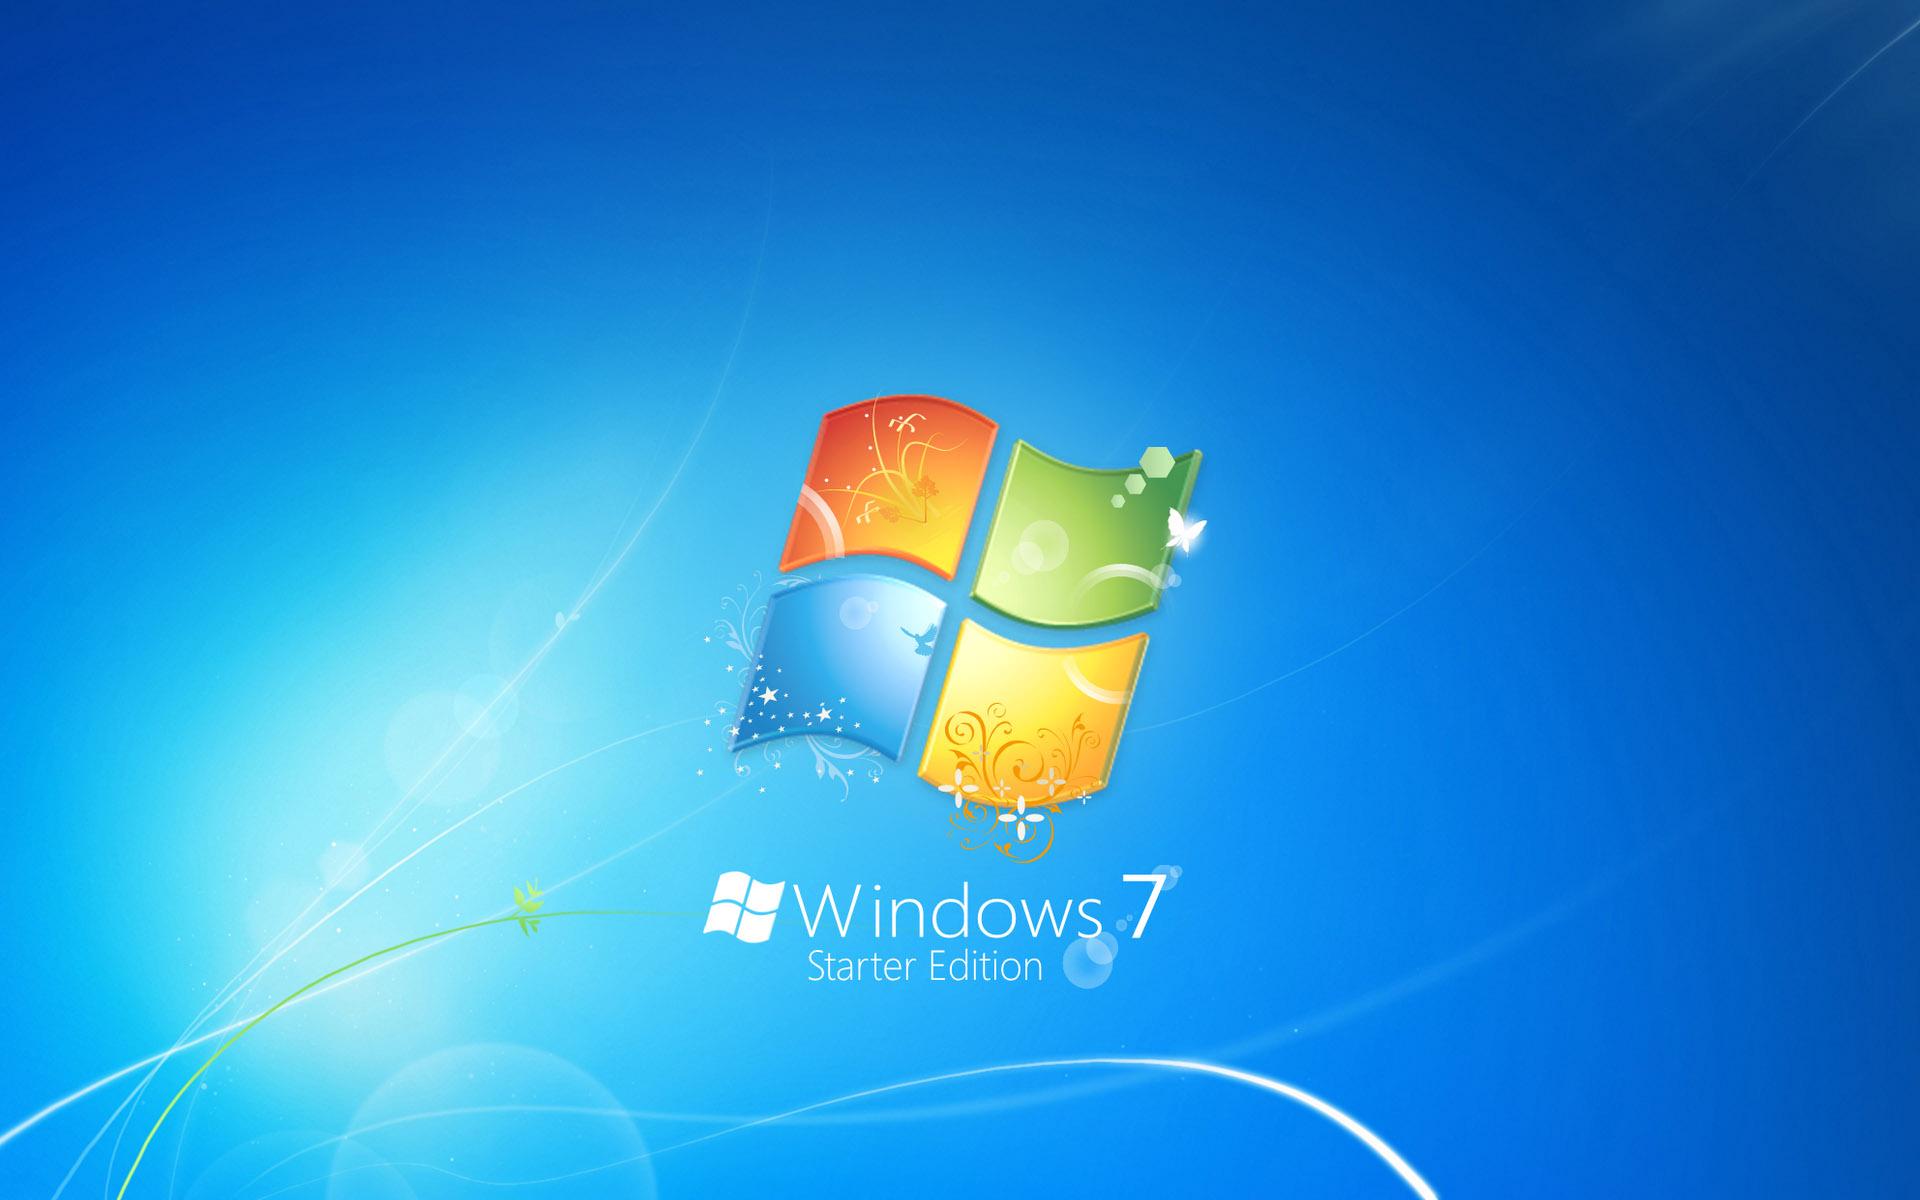 Hd wallpaper windows 7 - Windows 7 Starter Edition Wallpapers Hd Wallpapers